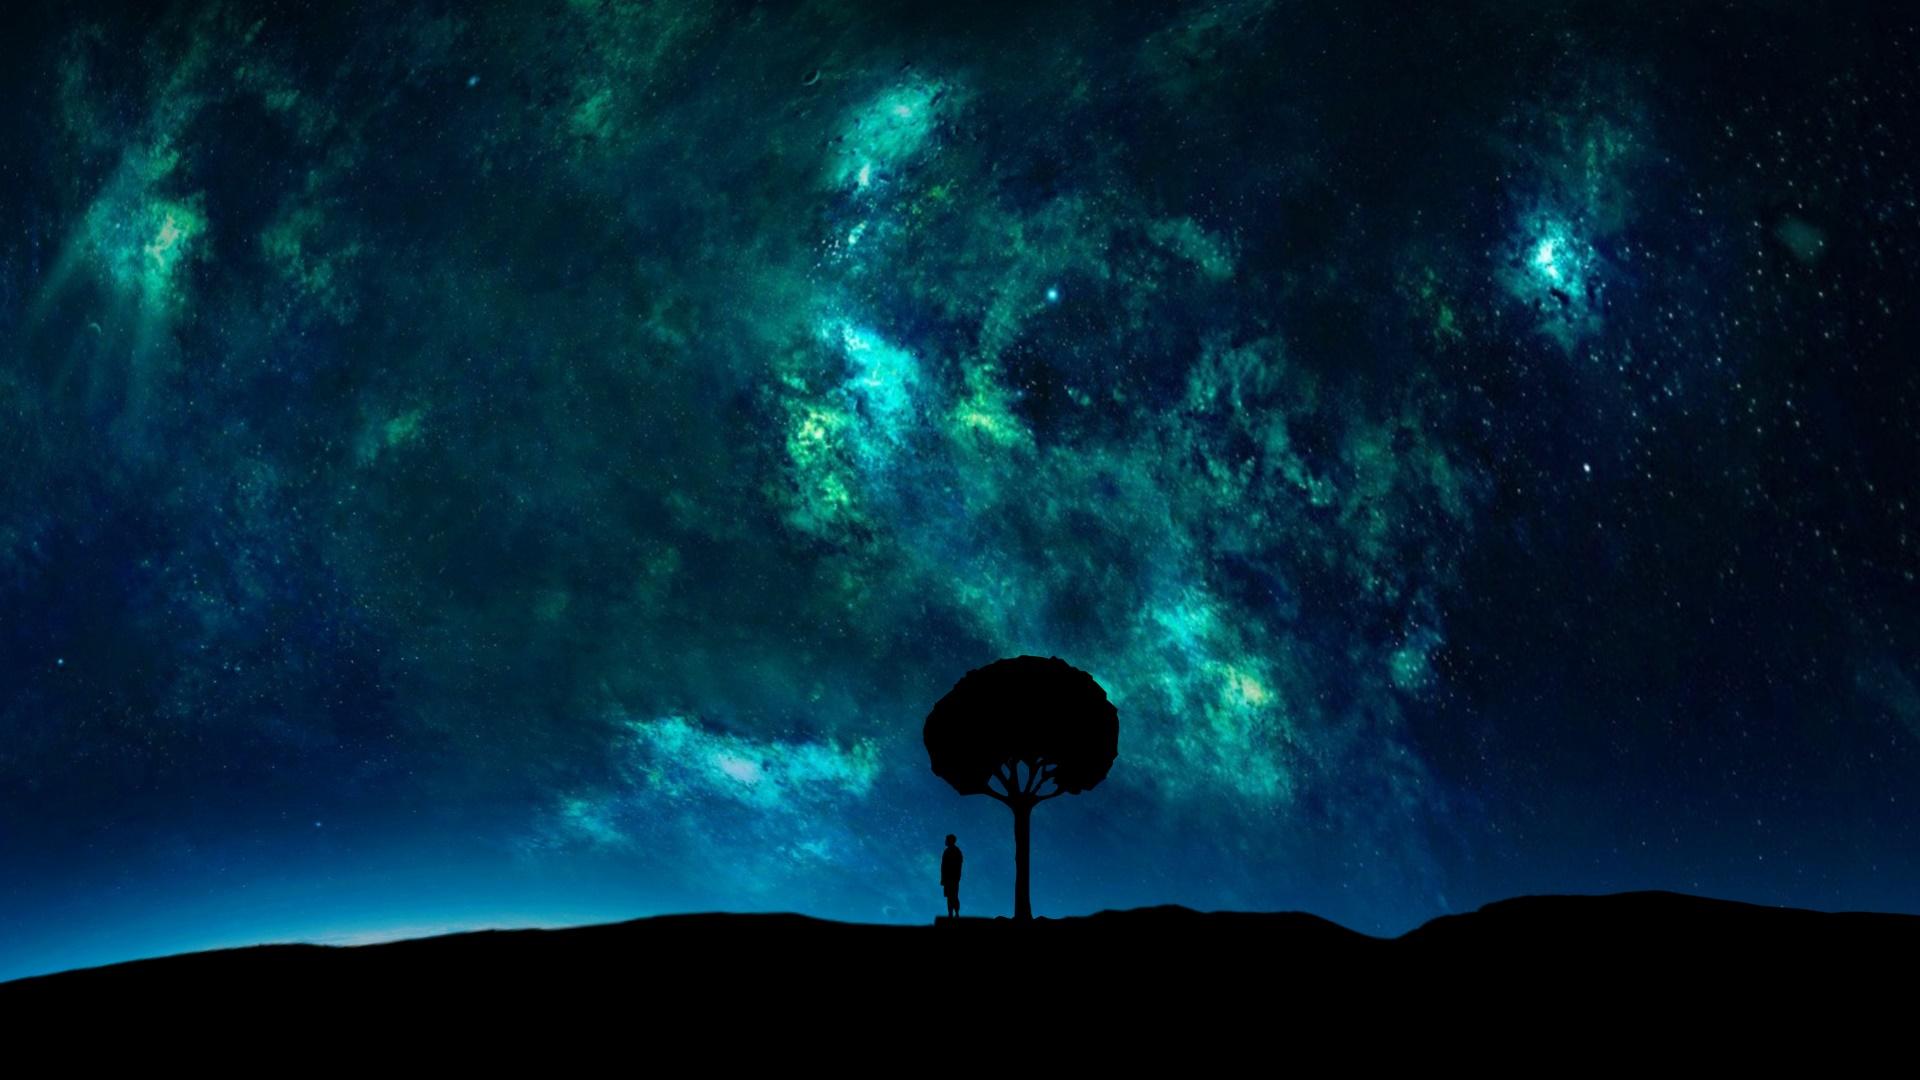 Mind space wallpaper